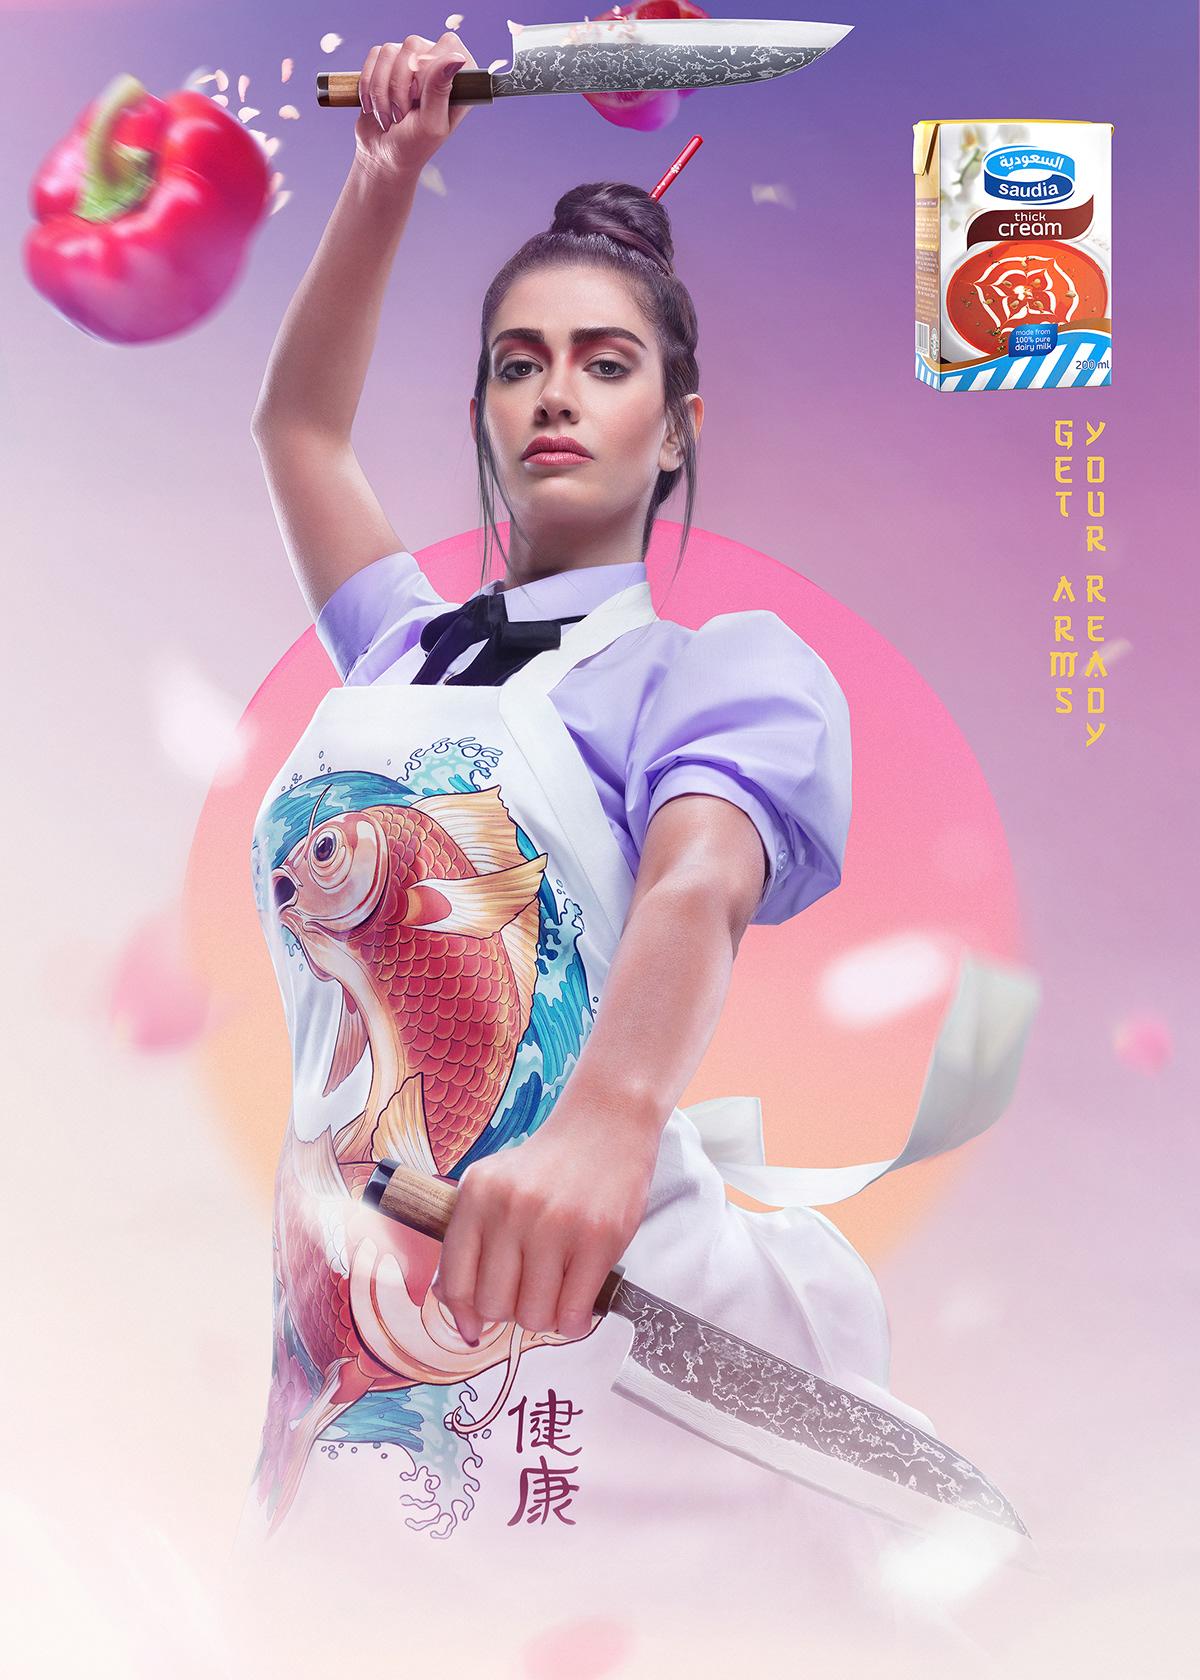 dubai Photography  campaign retouching  Advertising  UAE Saudi Qatar direction art